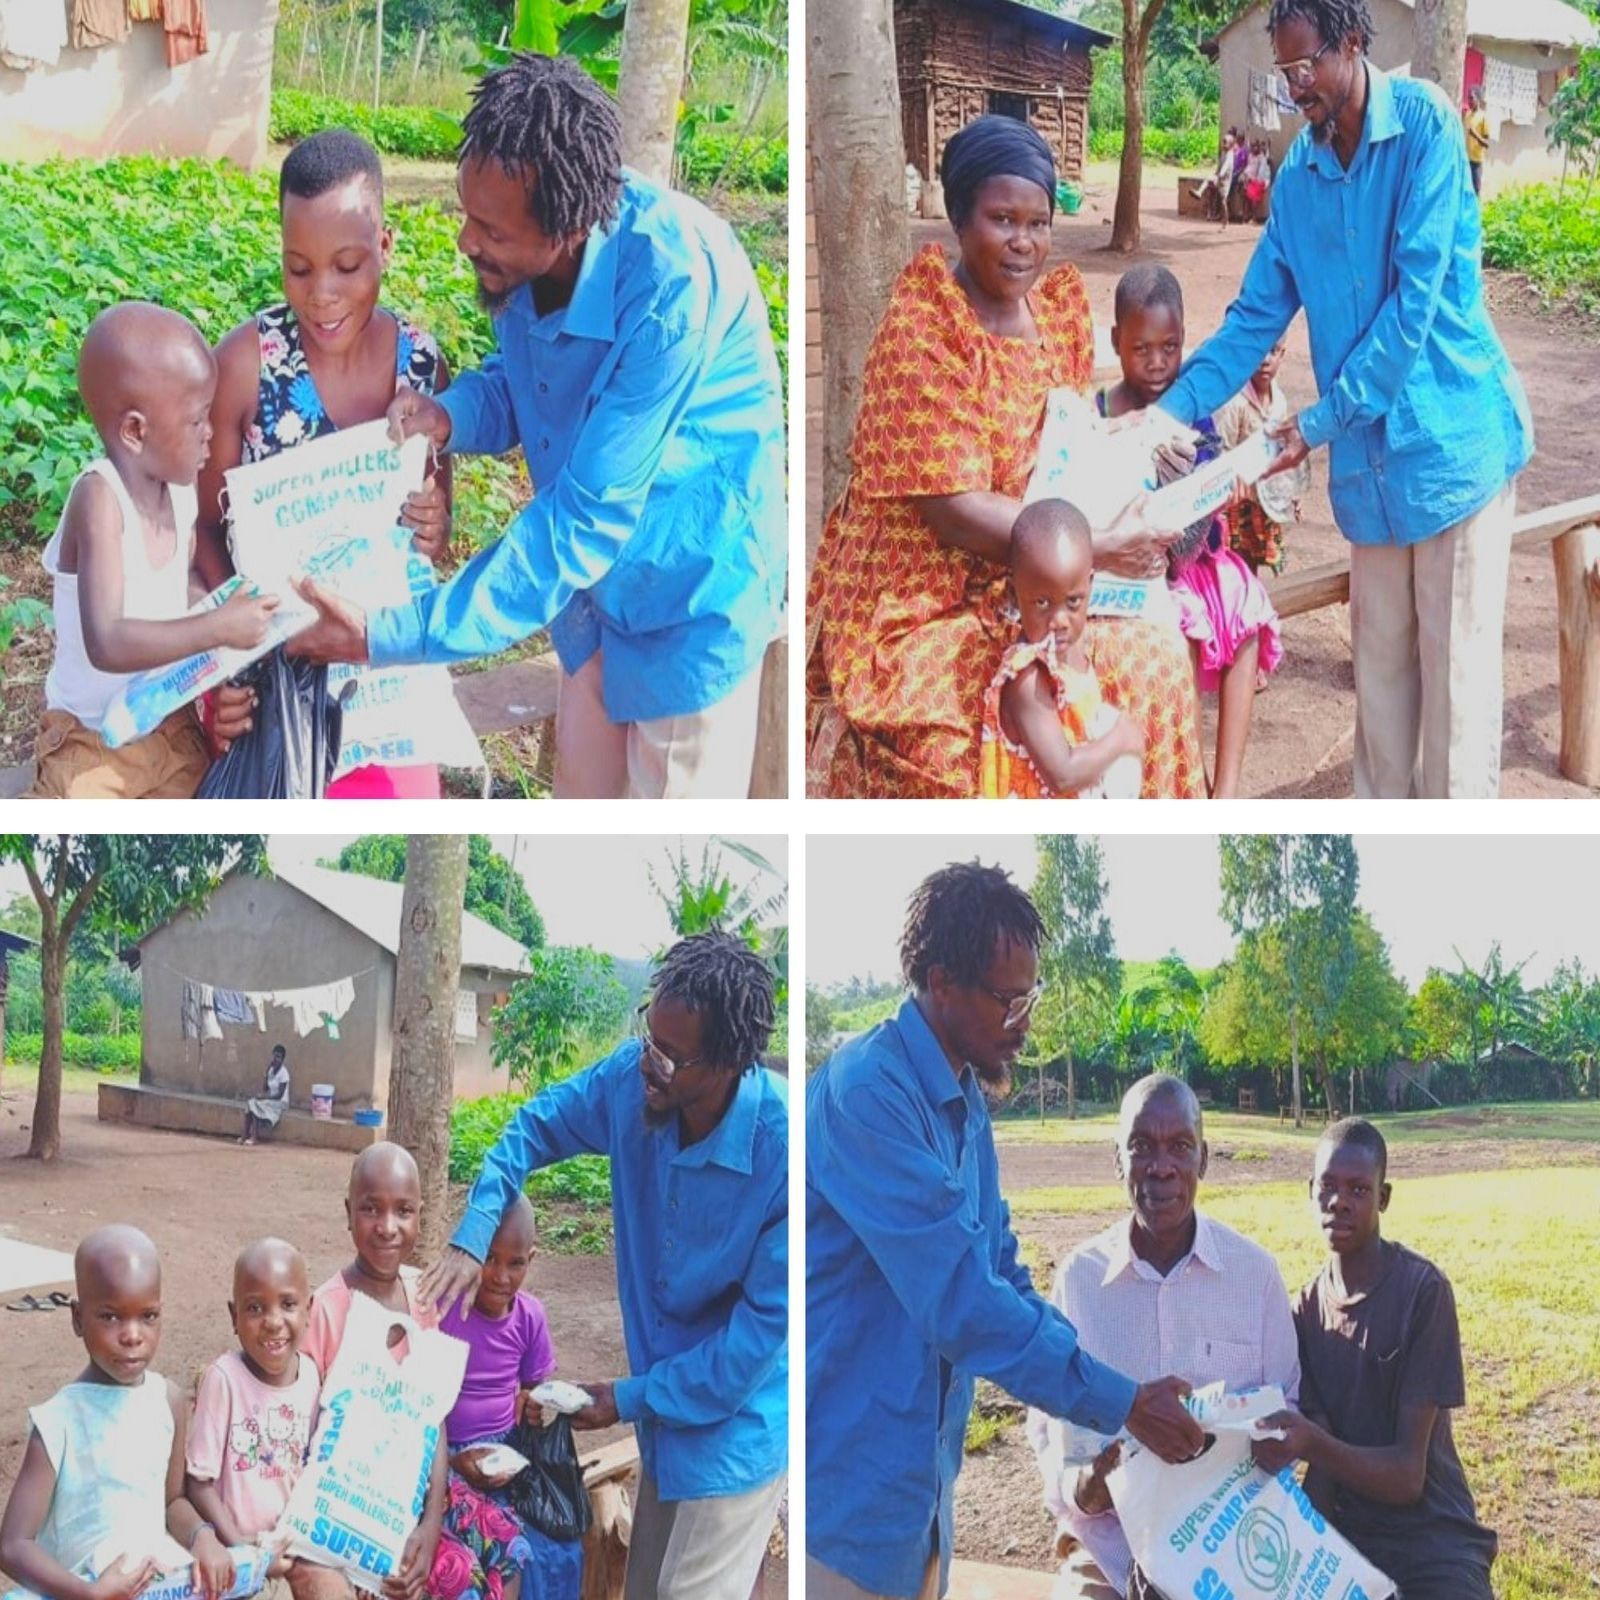 Receiving maize flour and soap